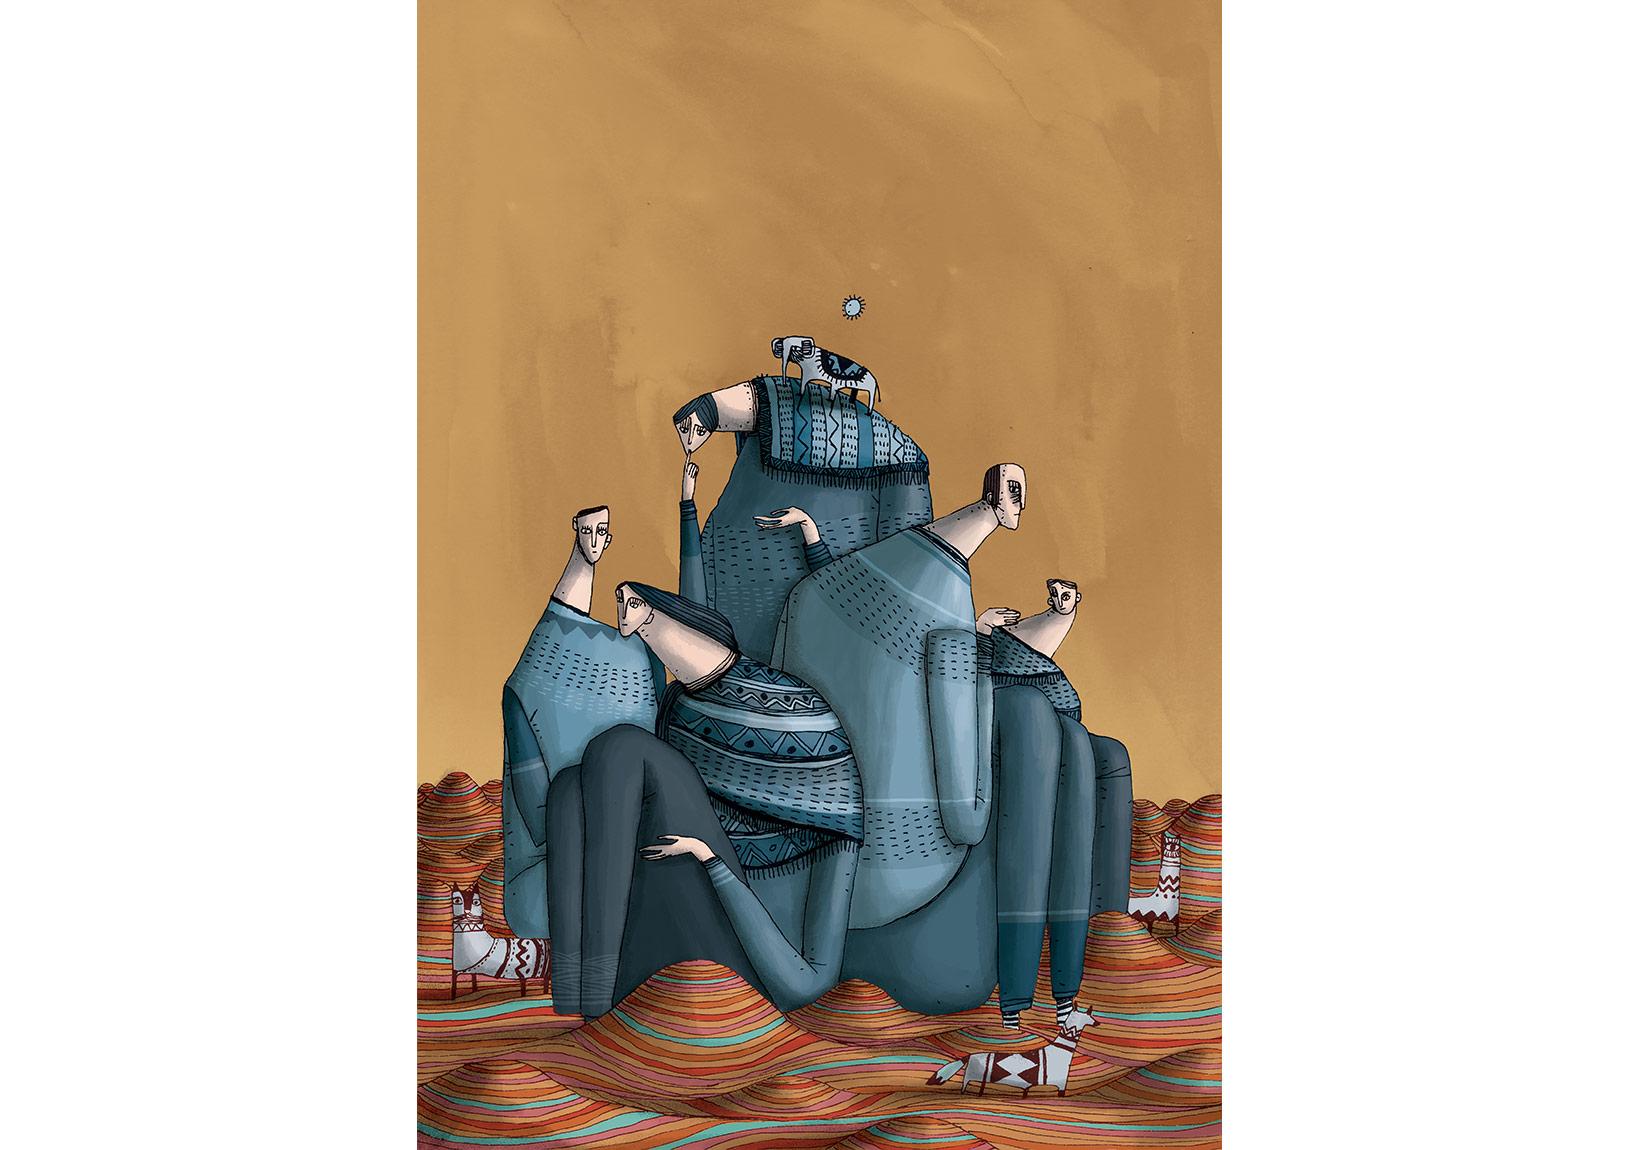 MERT TUGEN, Digitai İş II, 35x50 cm